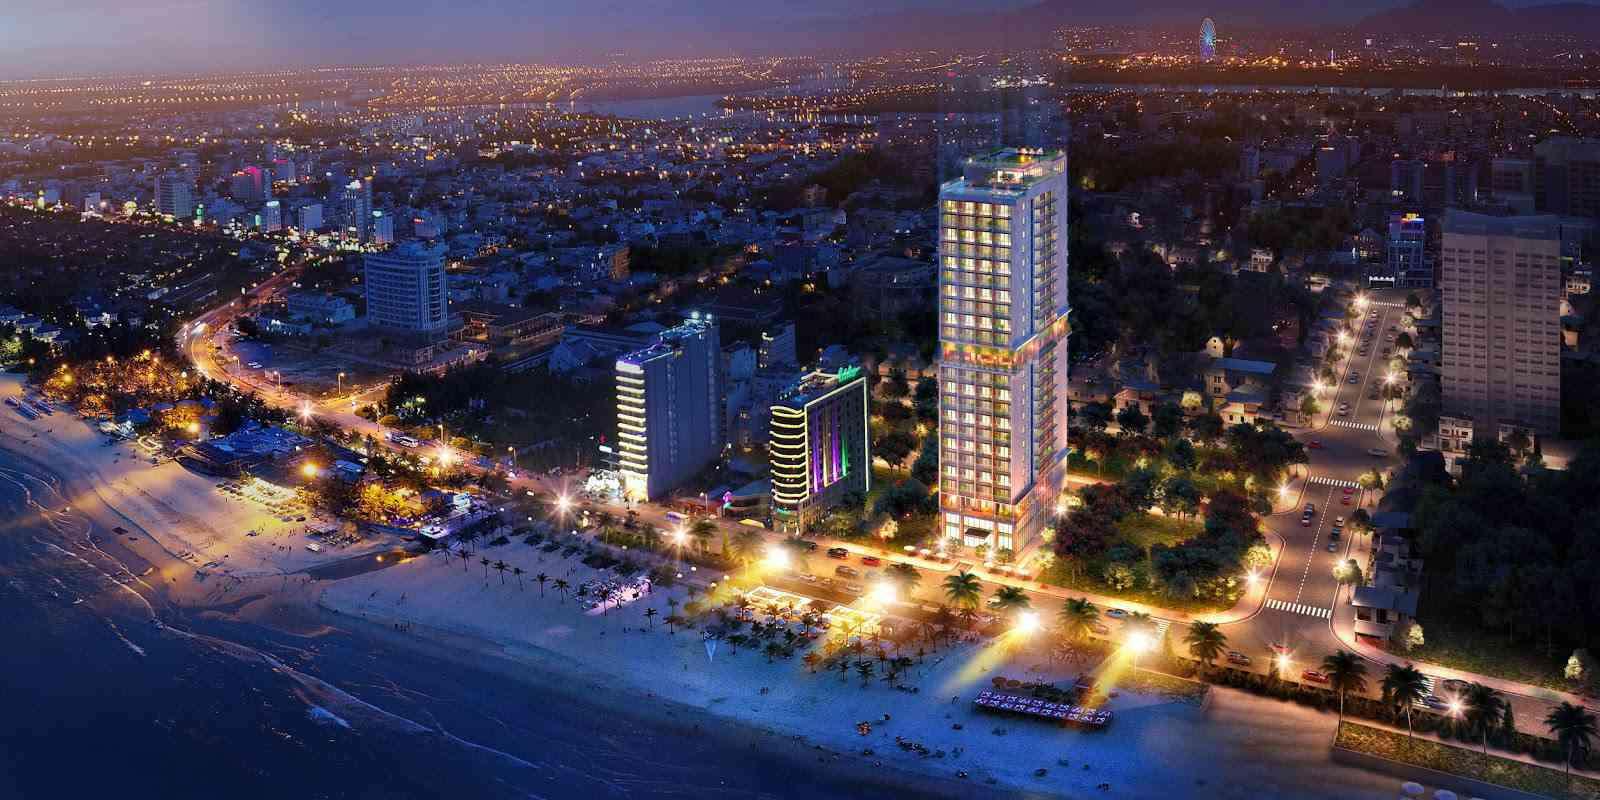 phoi-canh-du-an-tms-luxury-hotel-da-nang